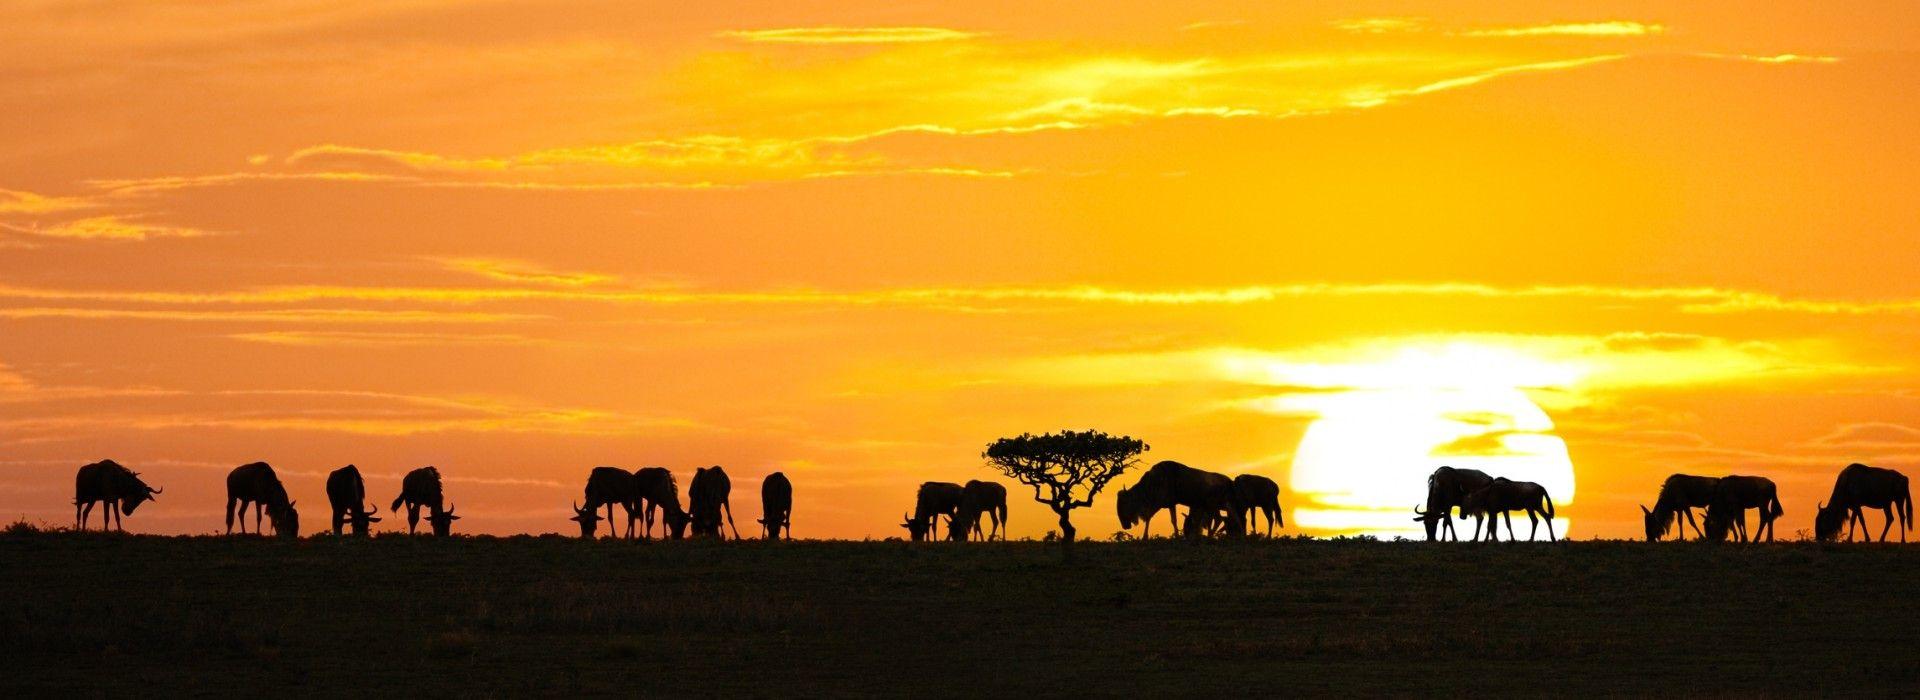 Kilimanjaro Moshi Sunset Tours